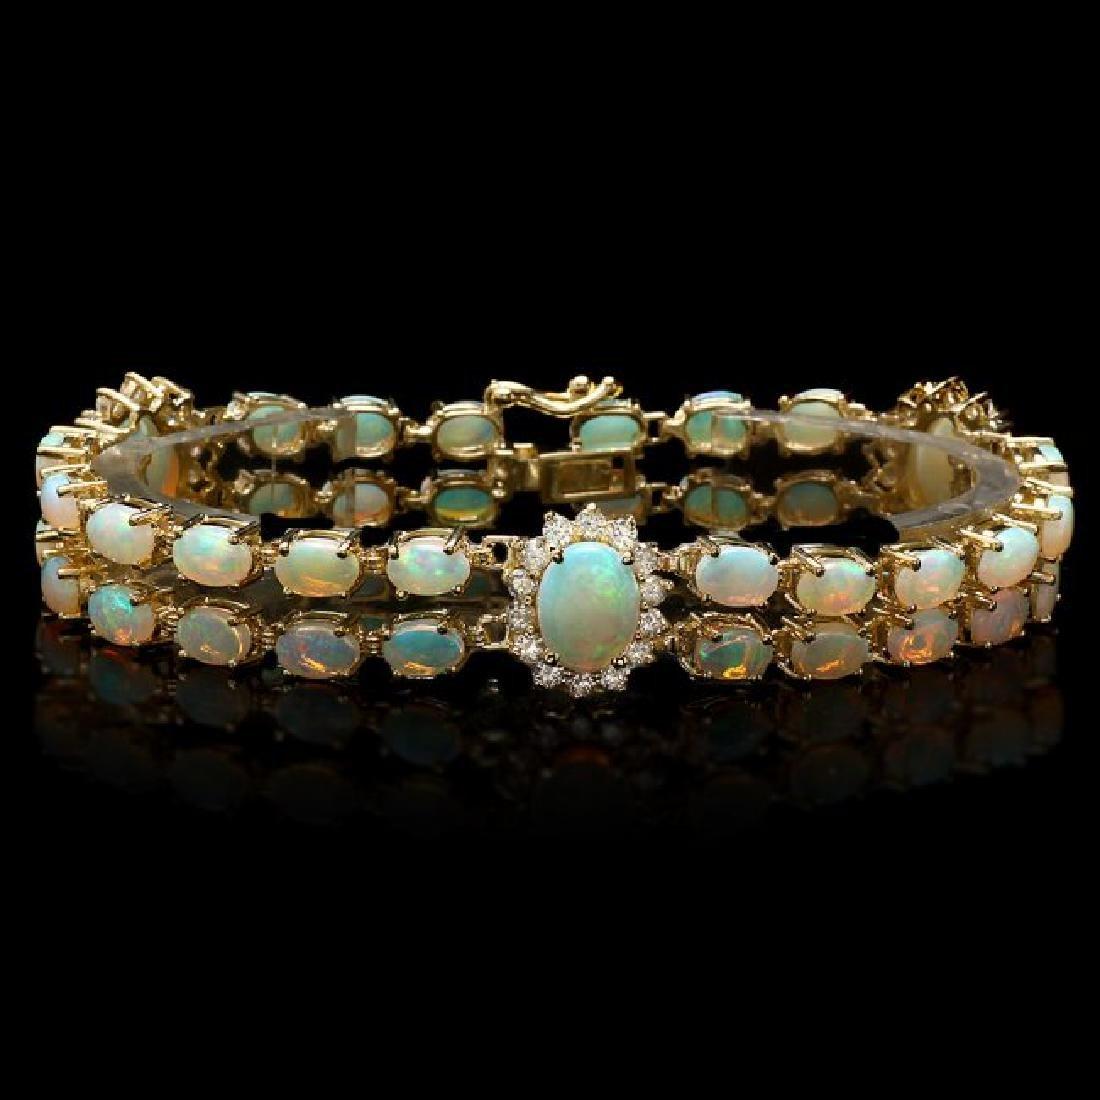 14k Gold 12.5ct Opal 1.75ct Diamond Bracelet